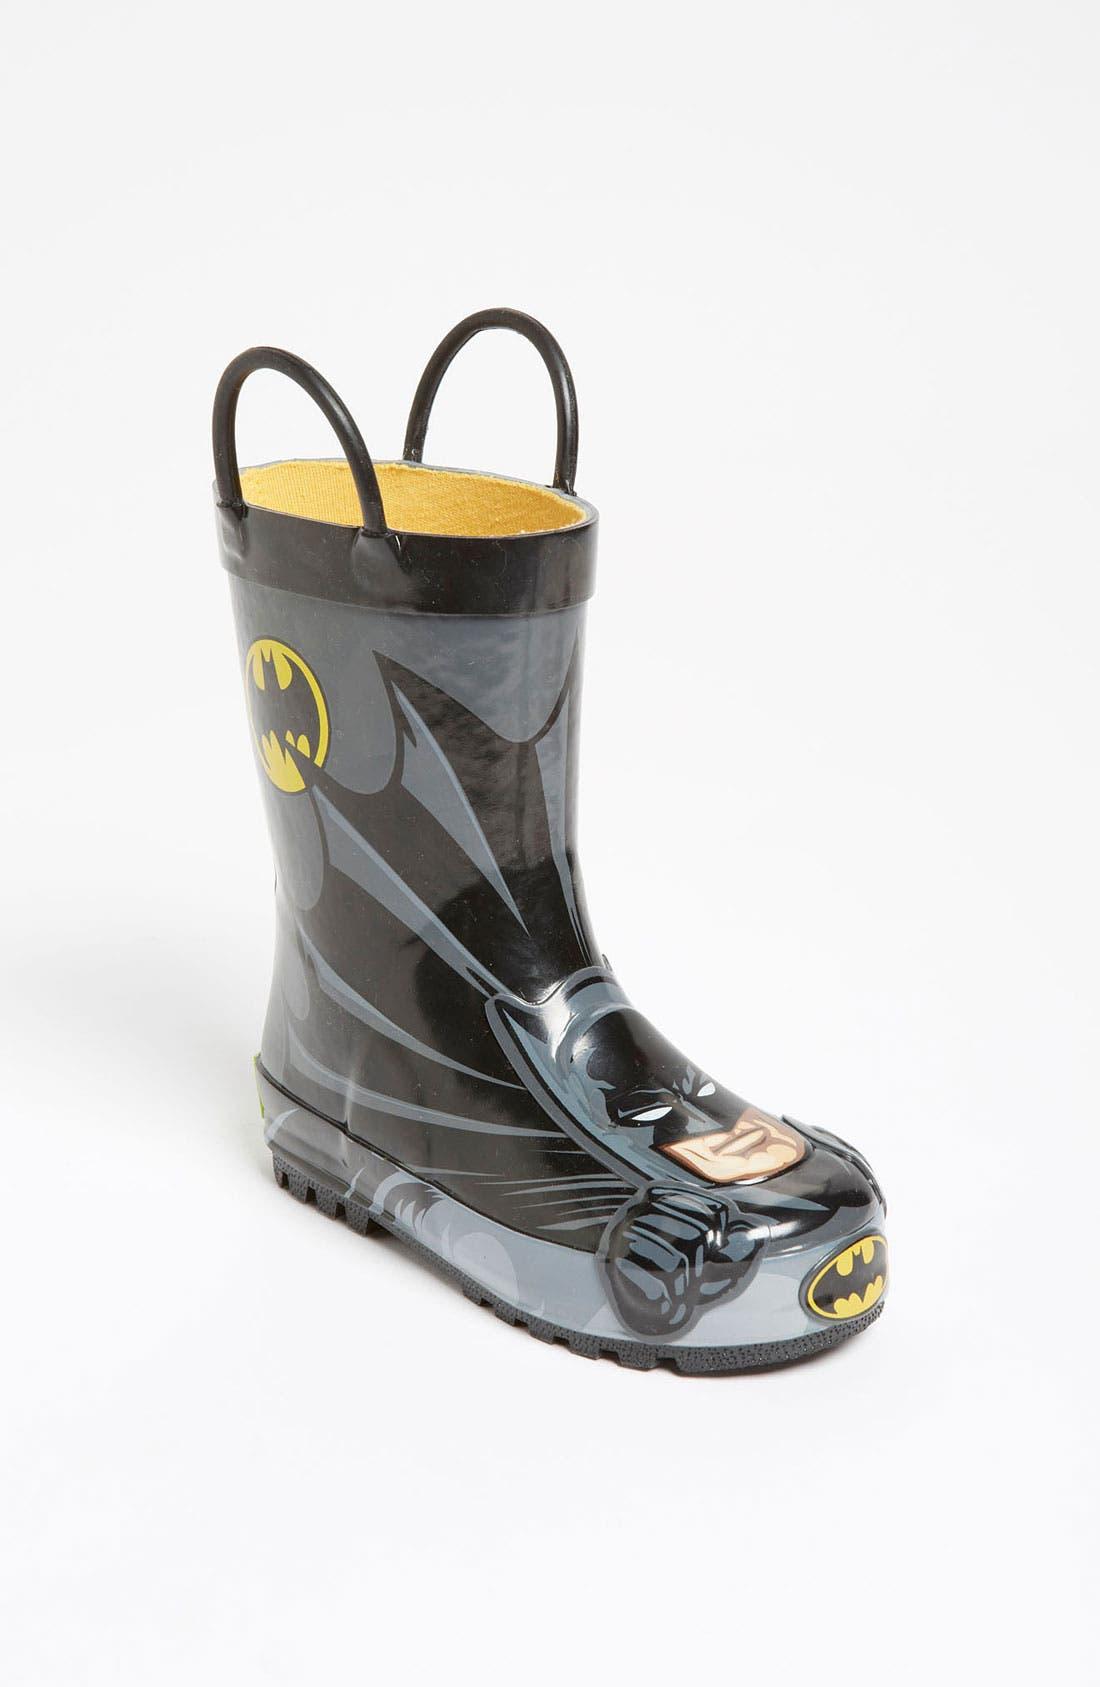 Main Image - WESTERN CHIEF BATMAN EVERLASTING RAIN BOOT